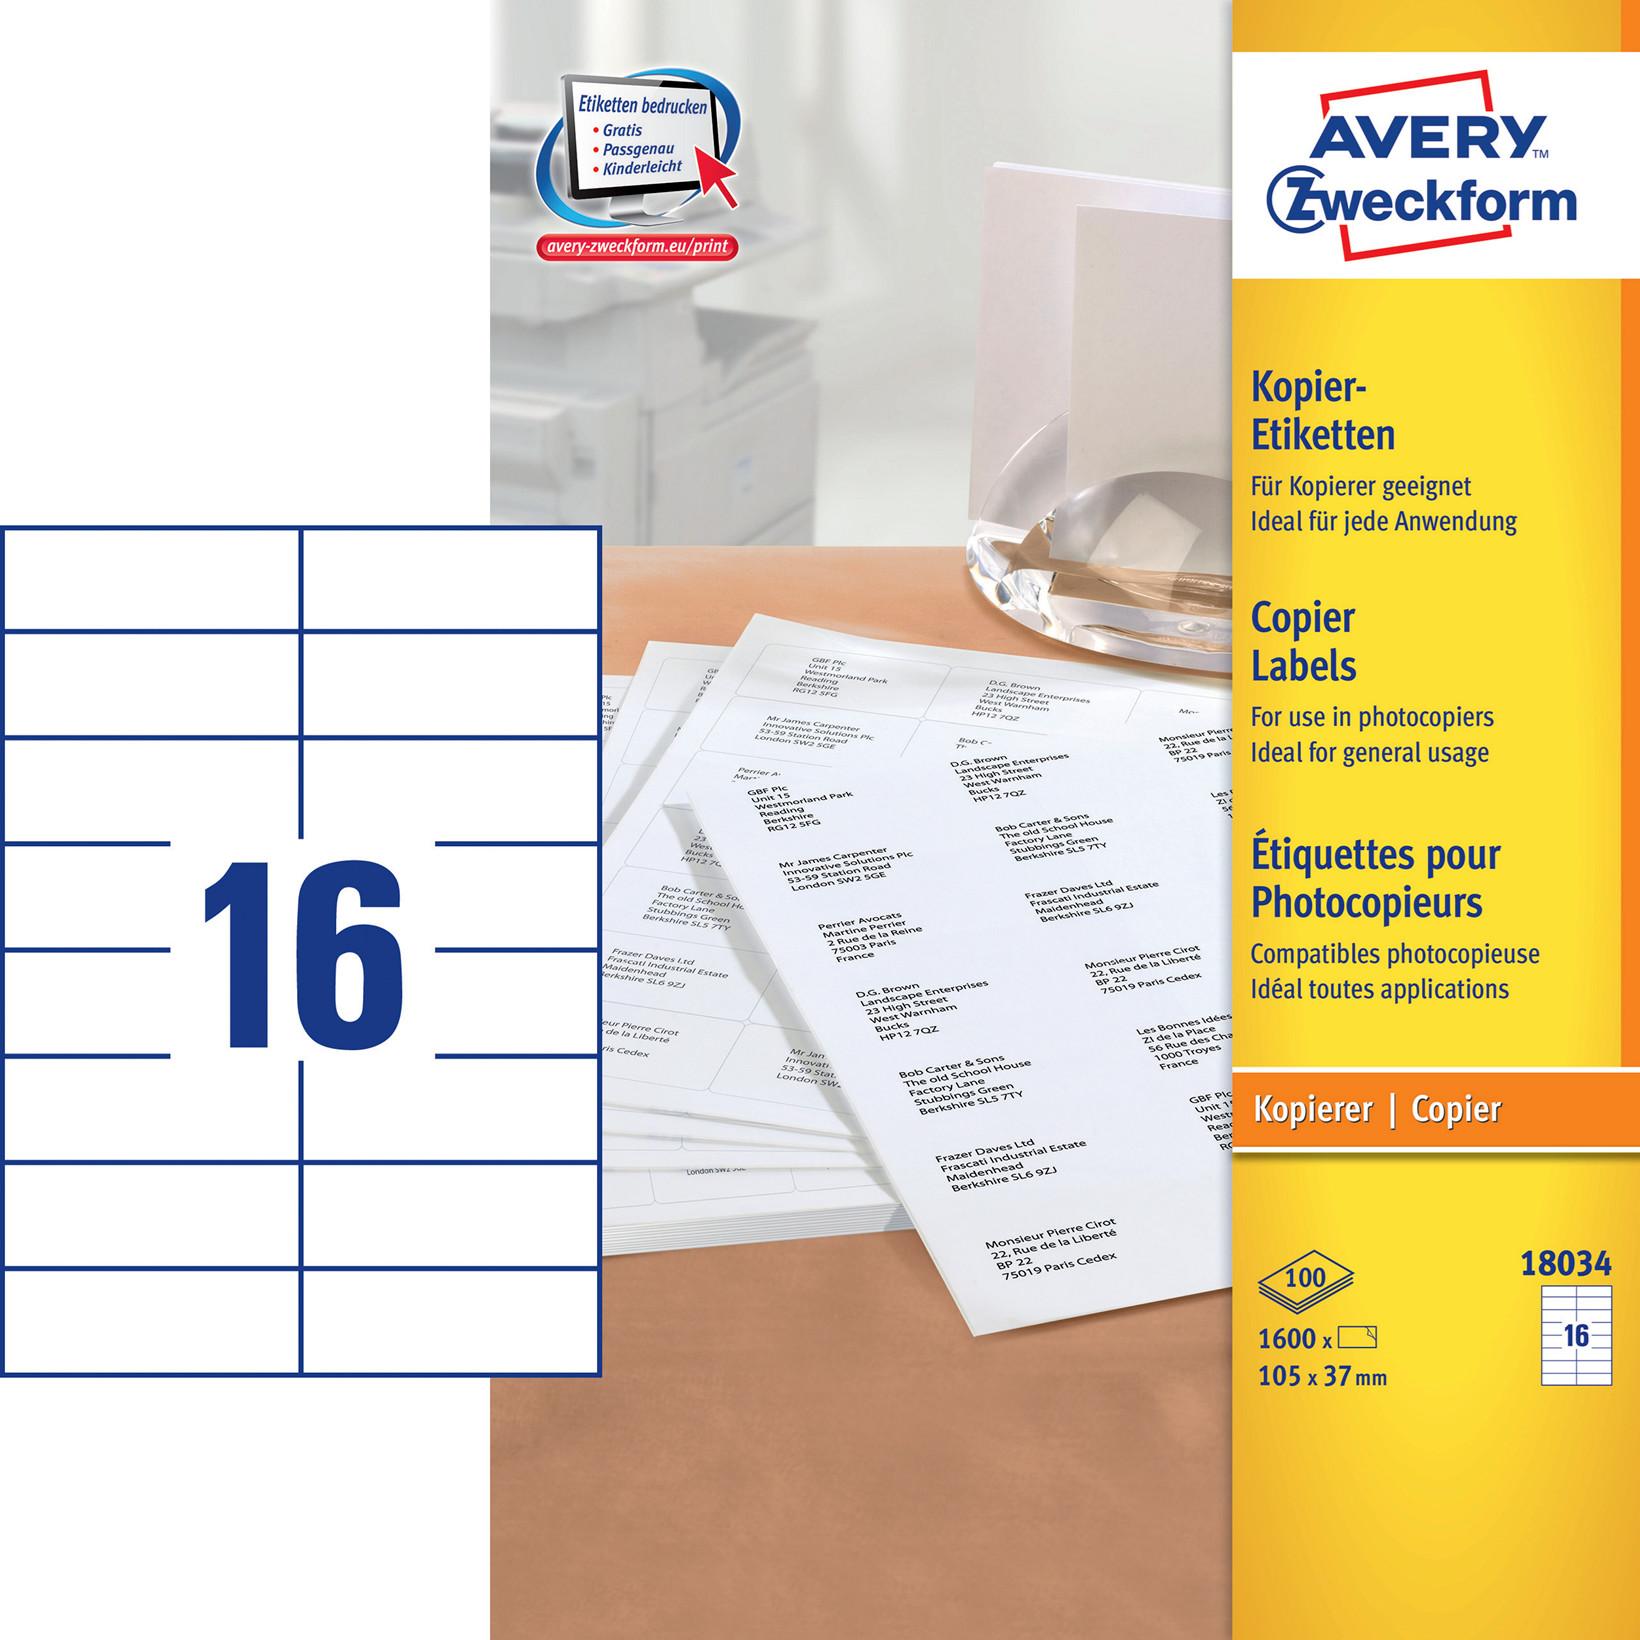 Avery 18034 - Kopietiket 16 pr. ark 37 x 105mm  - 100 ark